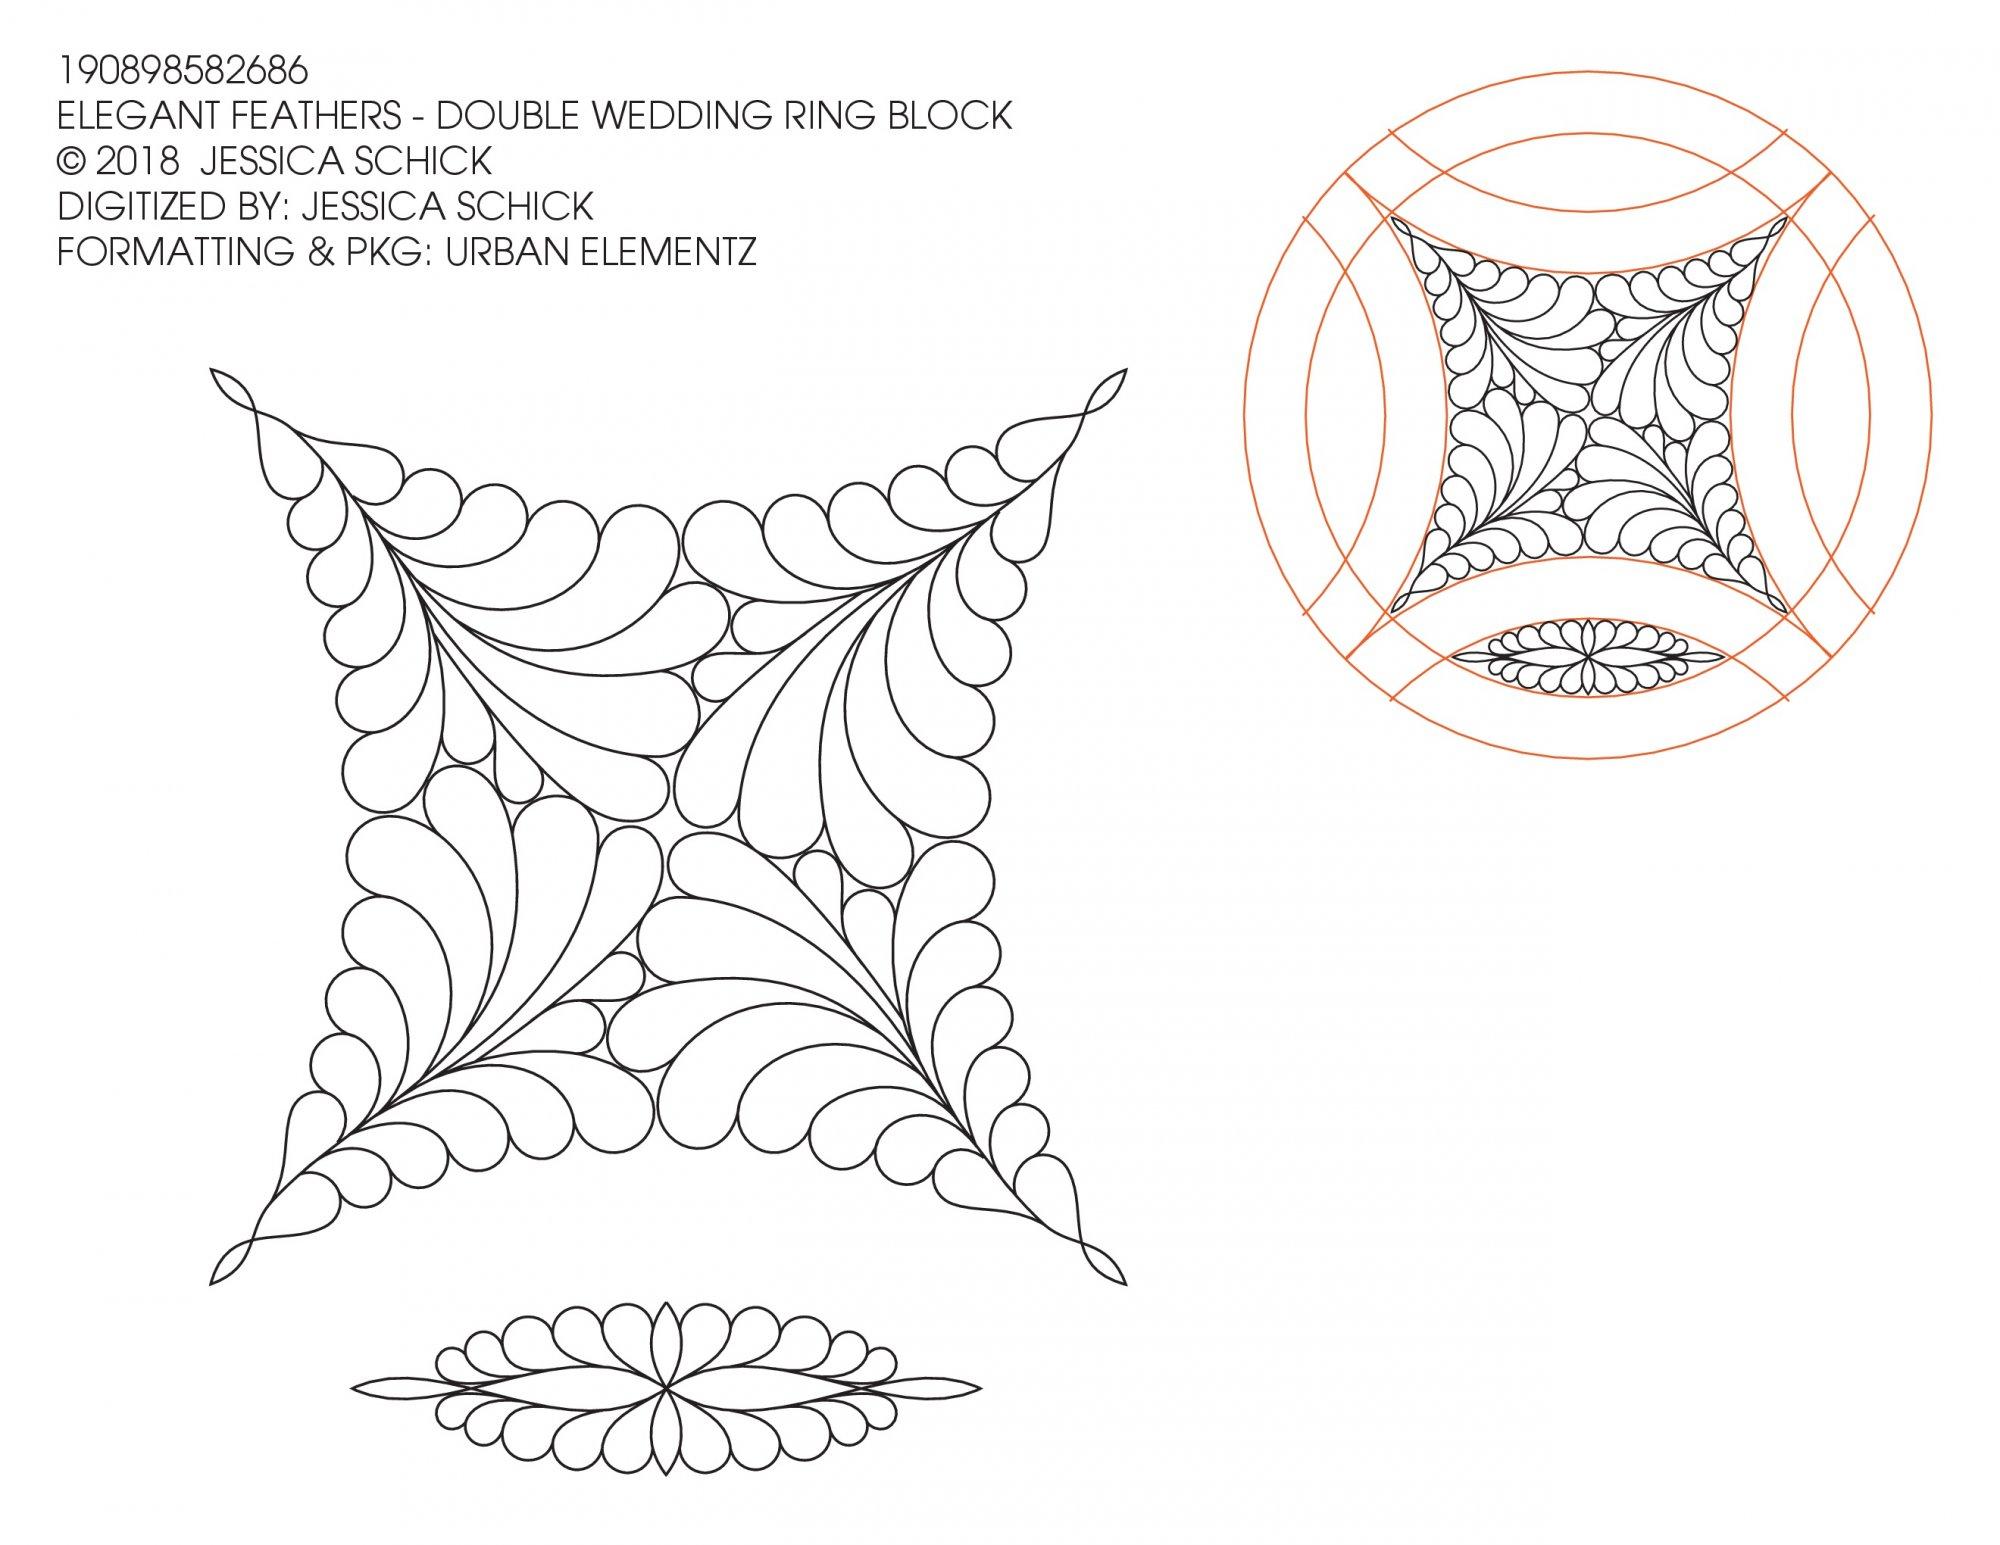 Elegant Feathers DWR Block